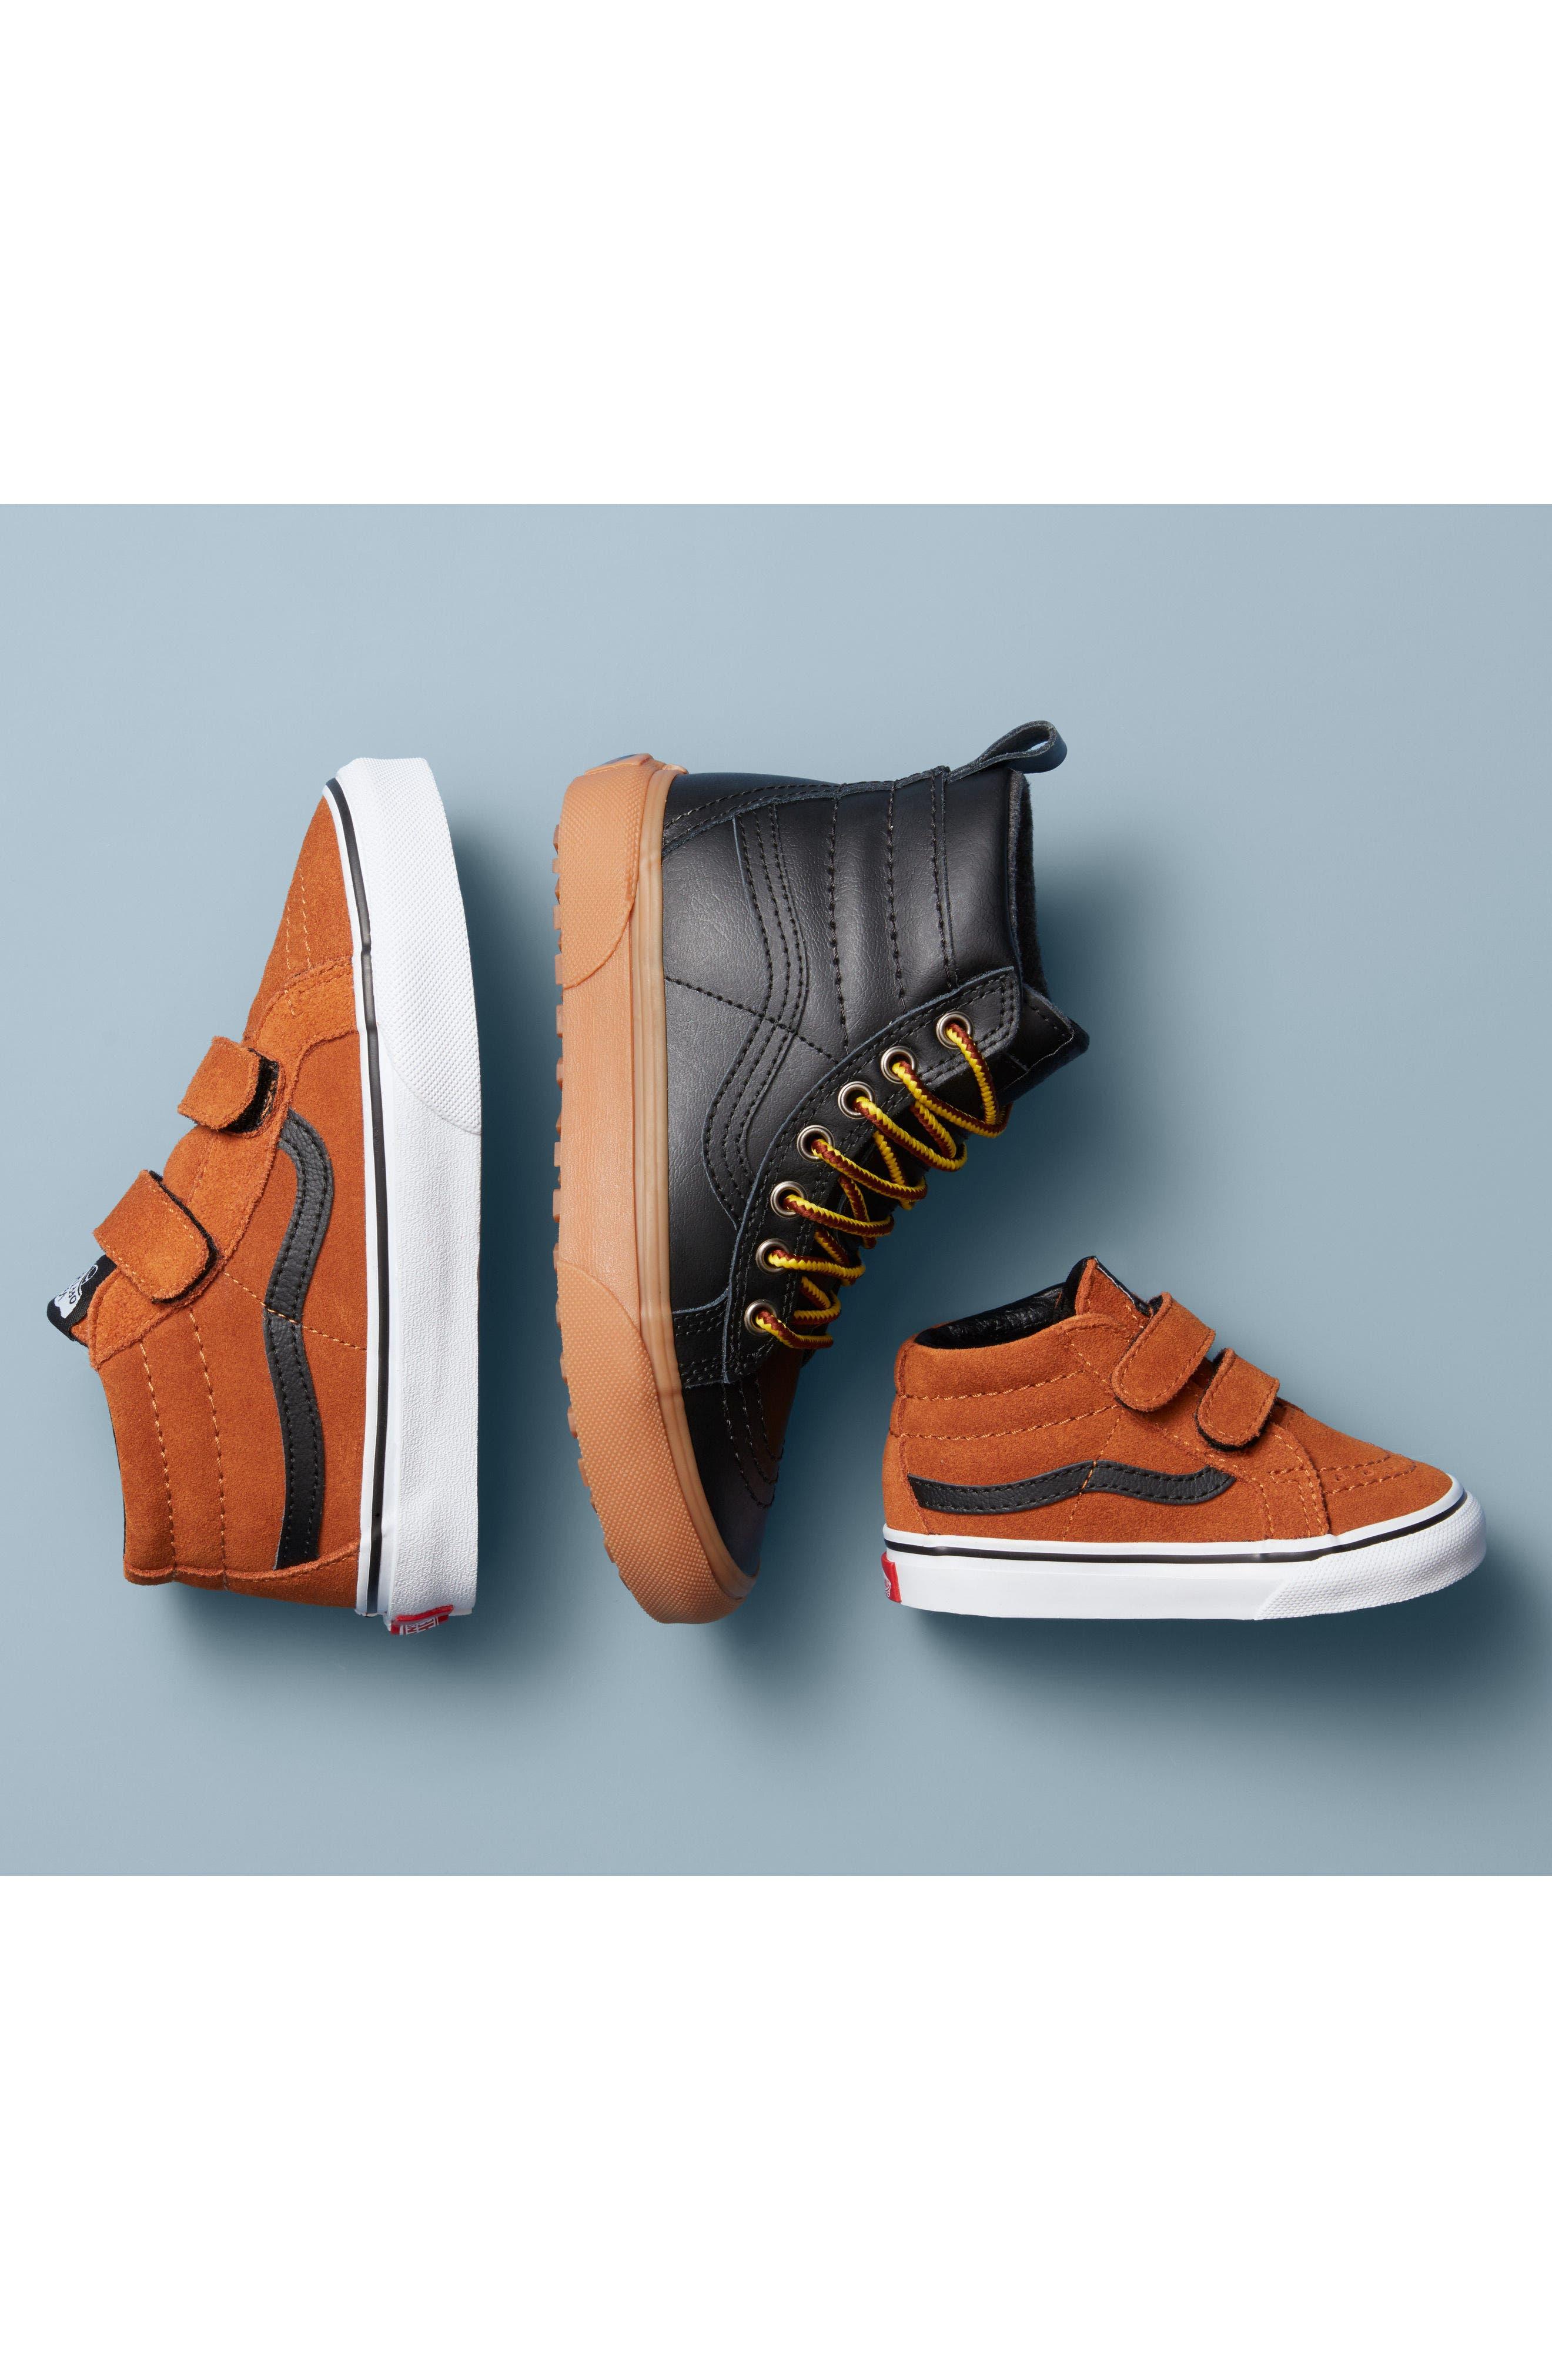 Toddler Vans Sk8Hi Sneaker Size 2 M  Grey